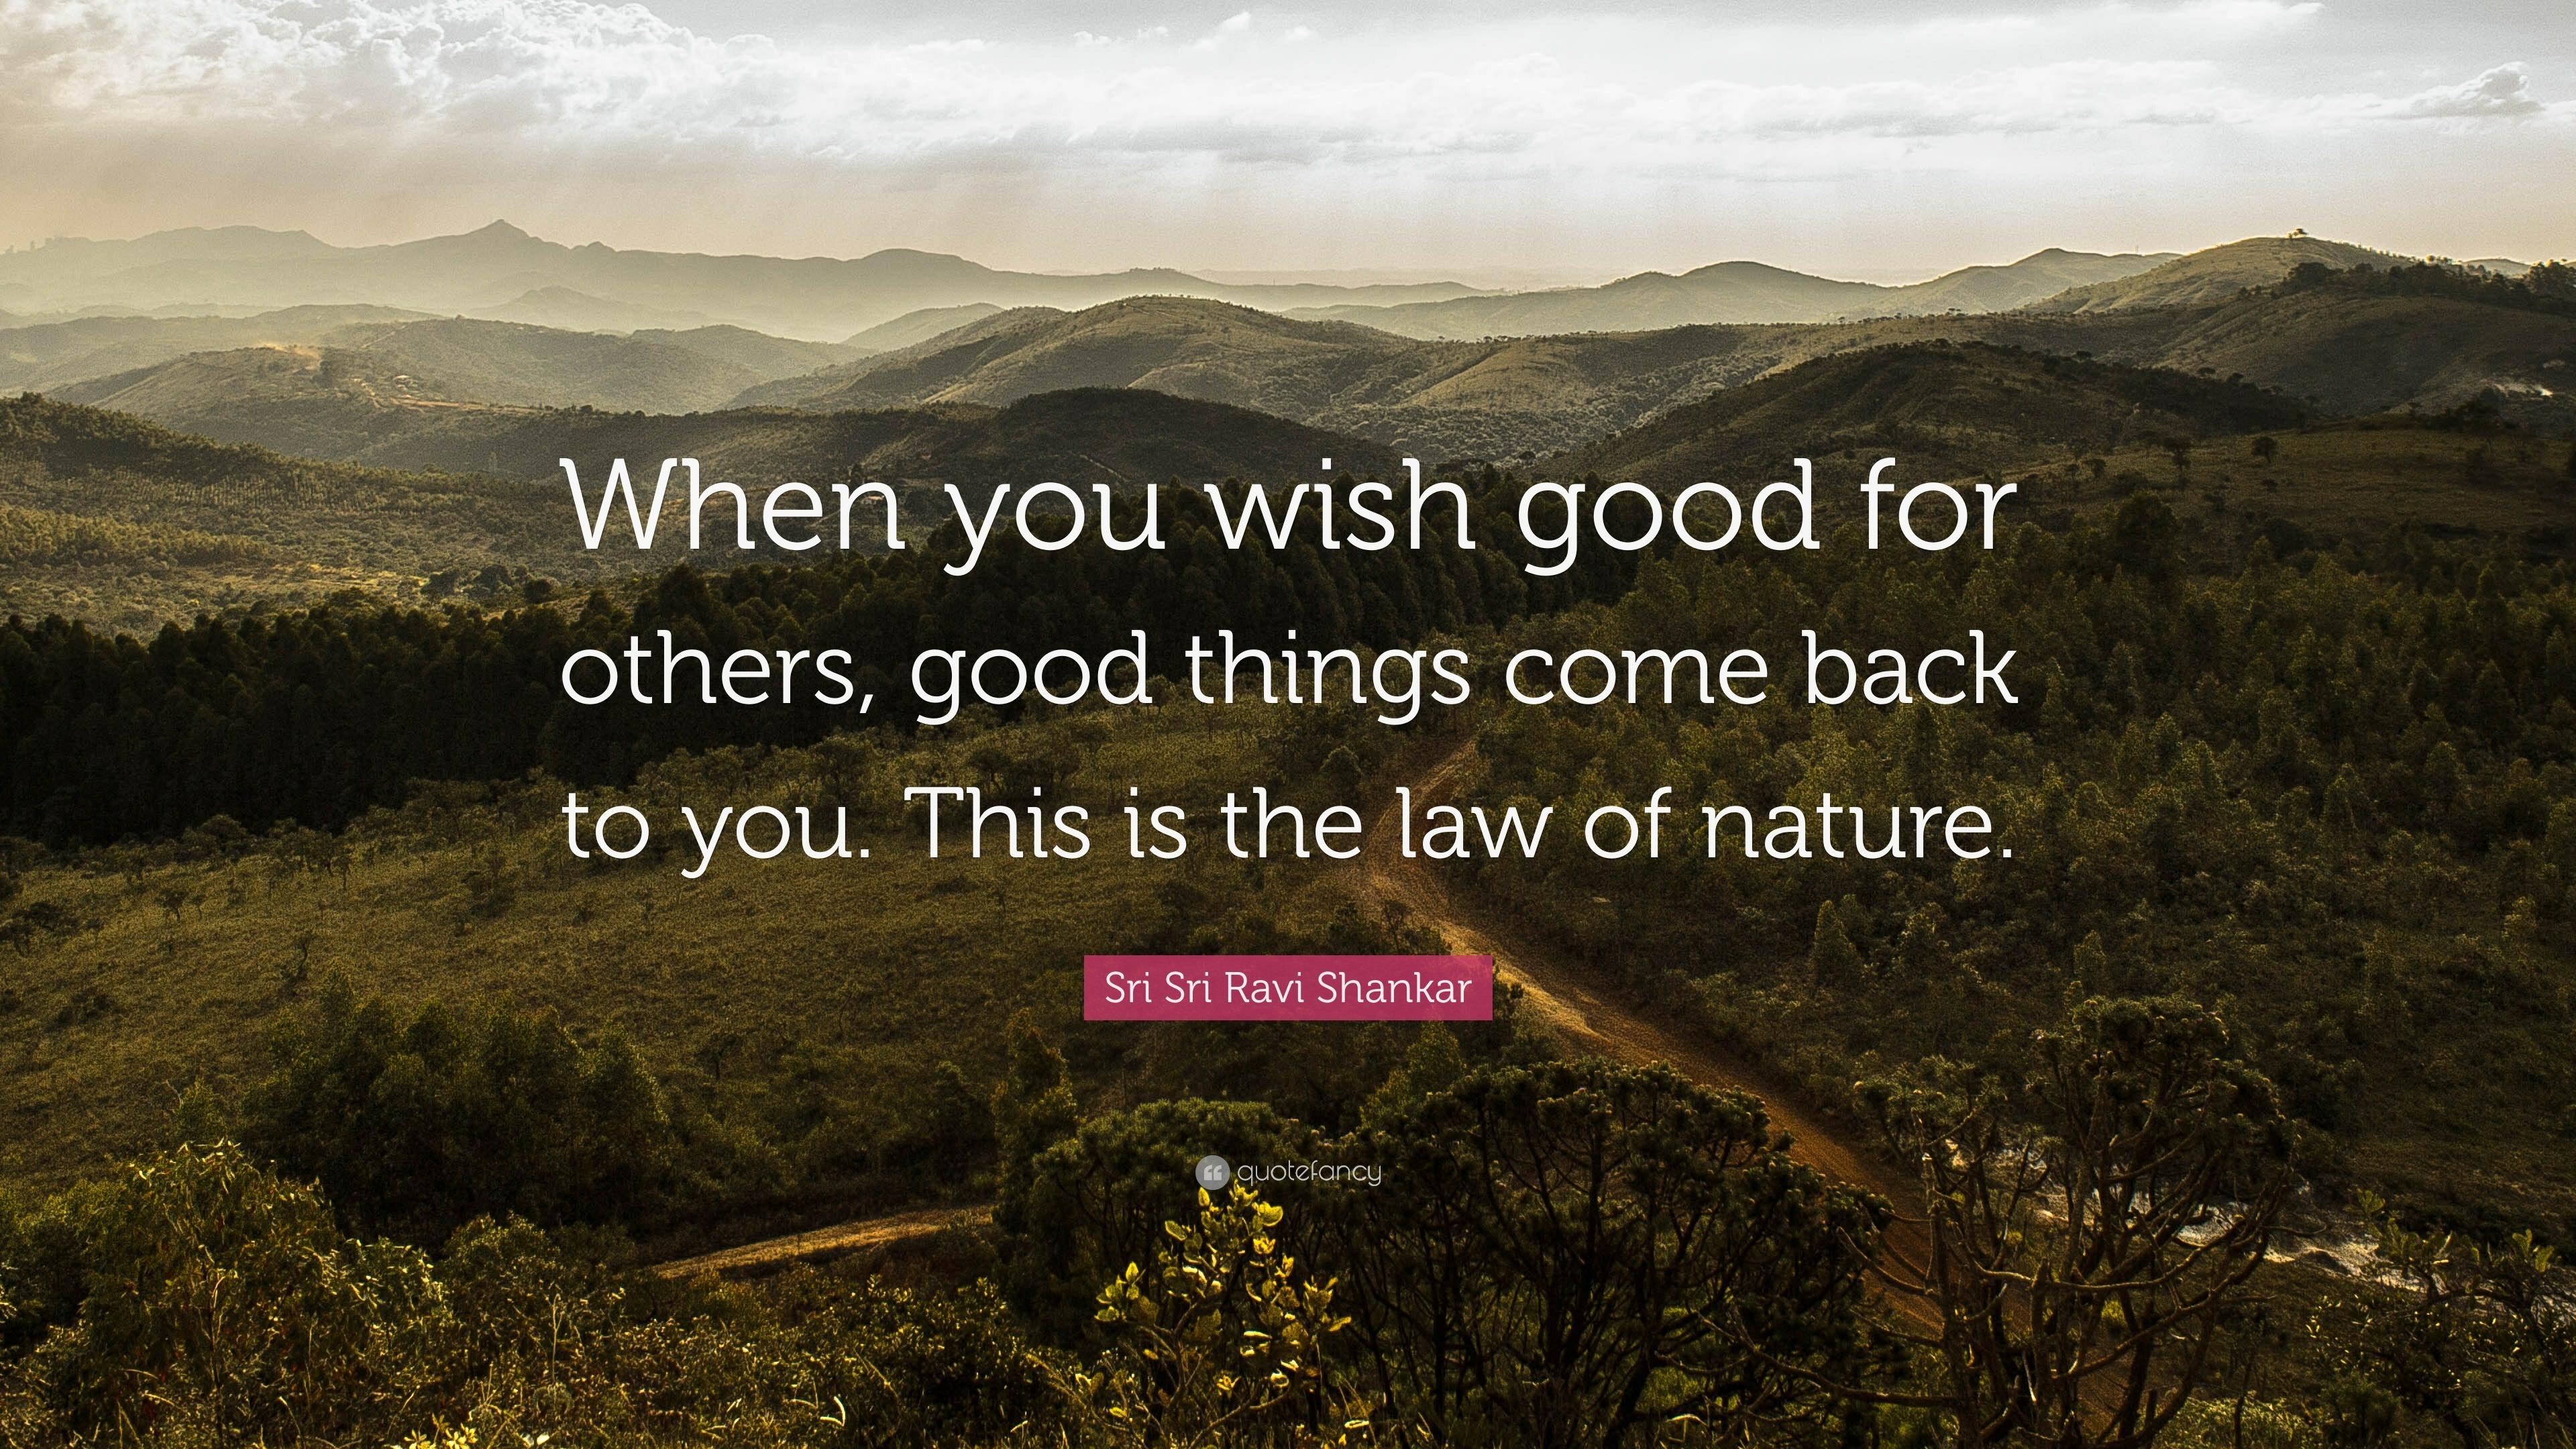 Sri Sri Ravi Shankar Quote When You Wish Good For Others Good